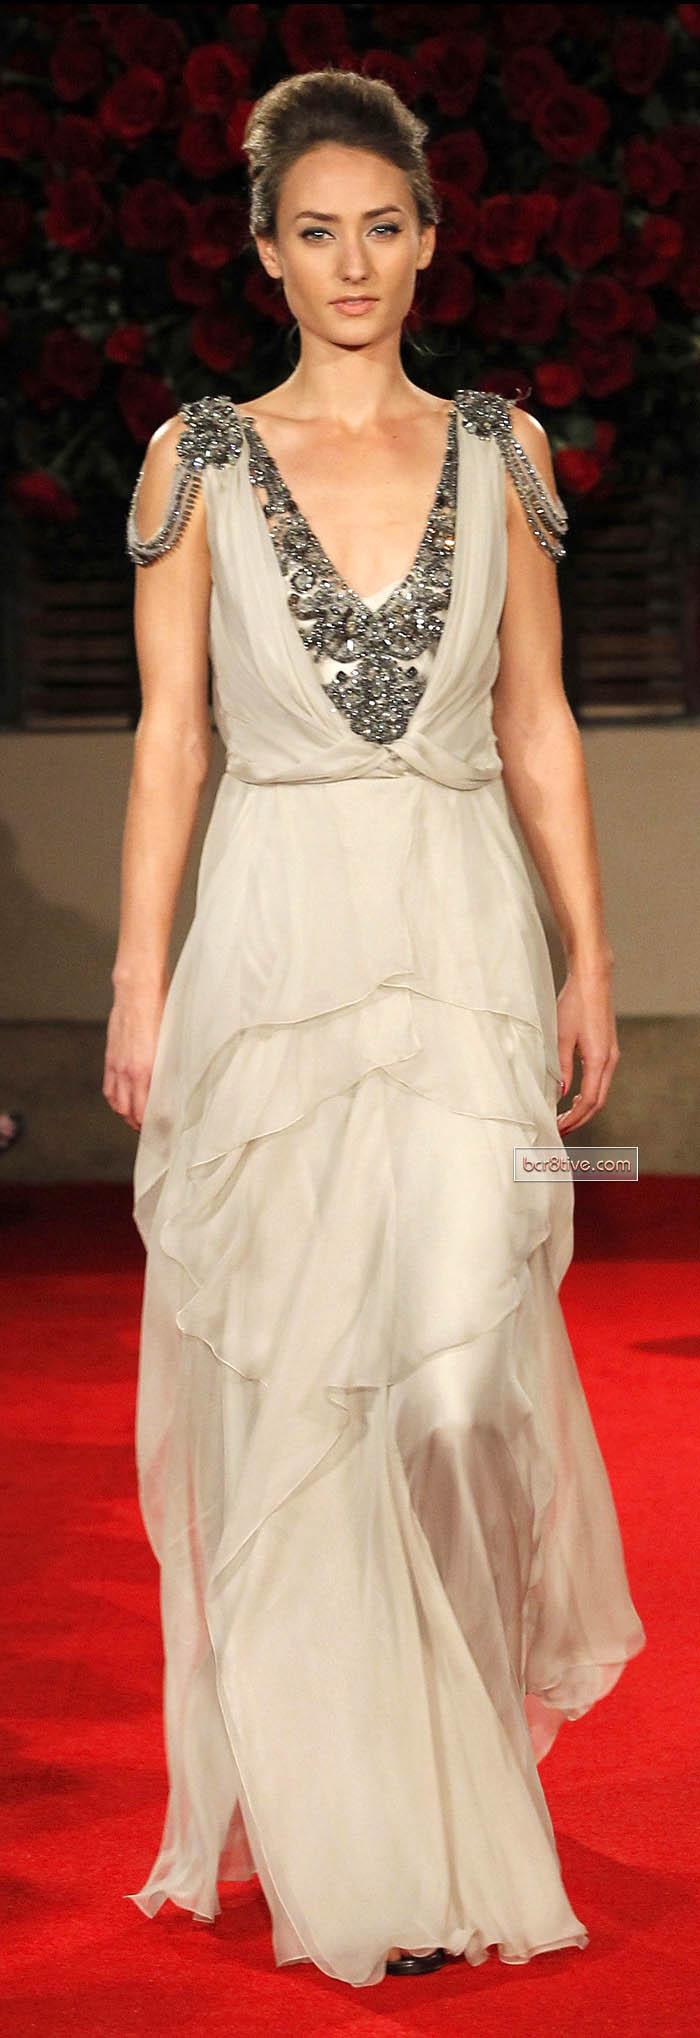 Alberta Ferretti FW 2013-14